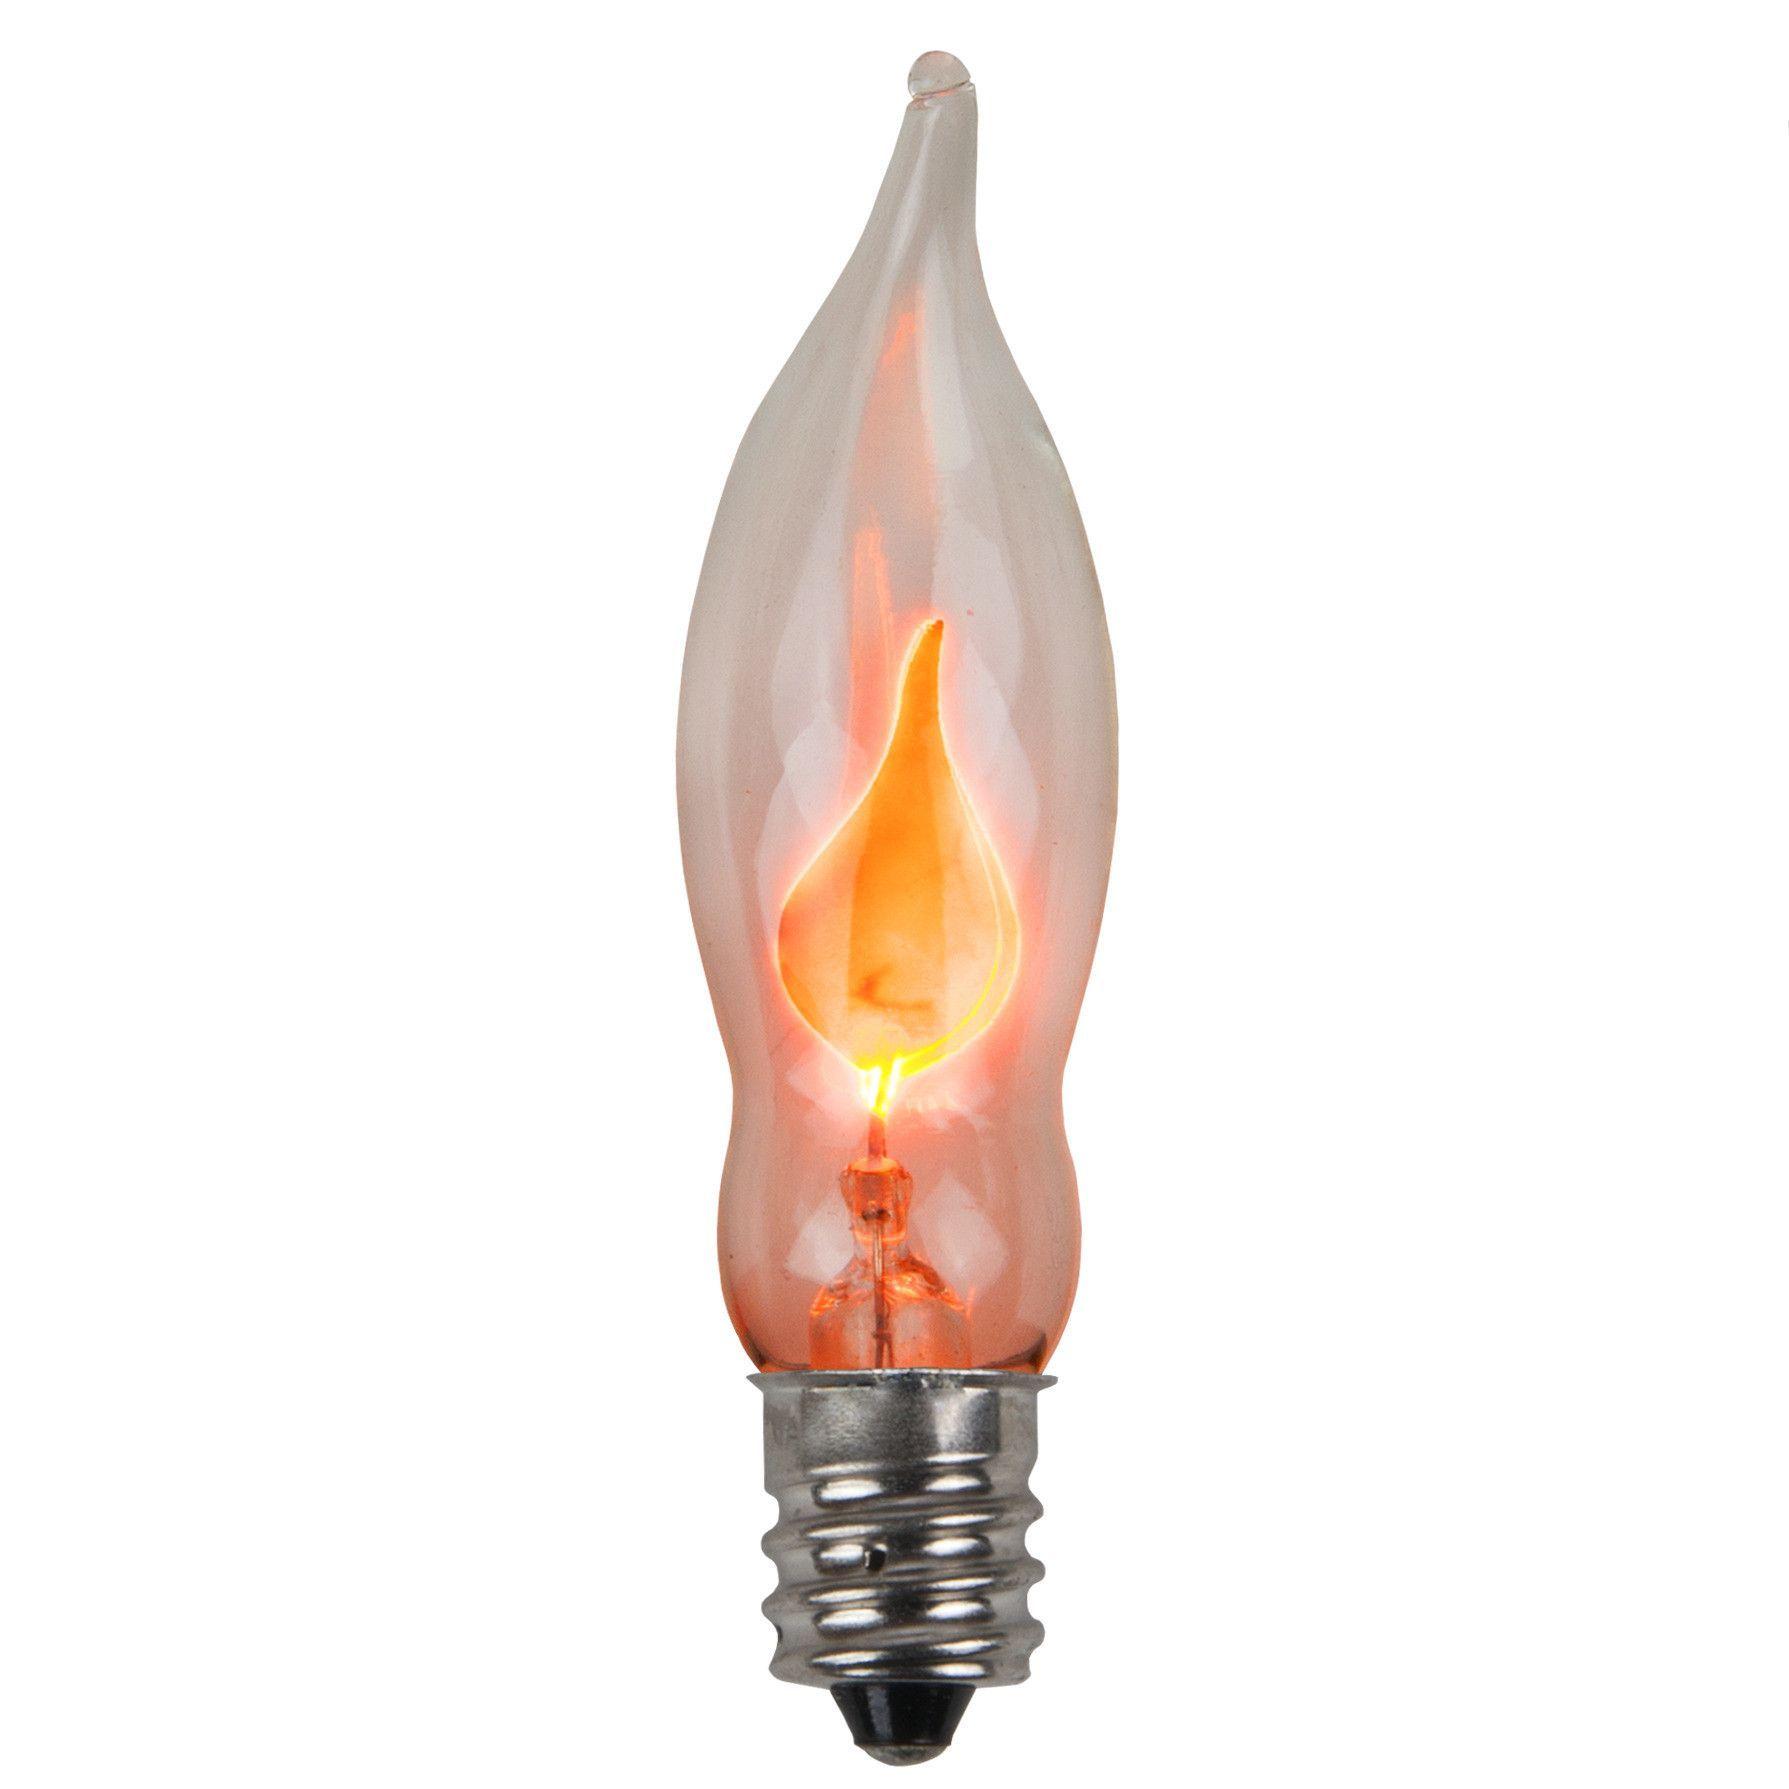 Wintergreen Lighting 3 5w C7 Flicker Flame Light Bulb Pack Of 2 Outdoor Light Bulbs Light Bulb Candle Flickering Lights